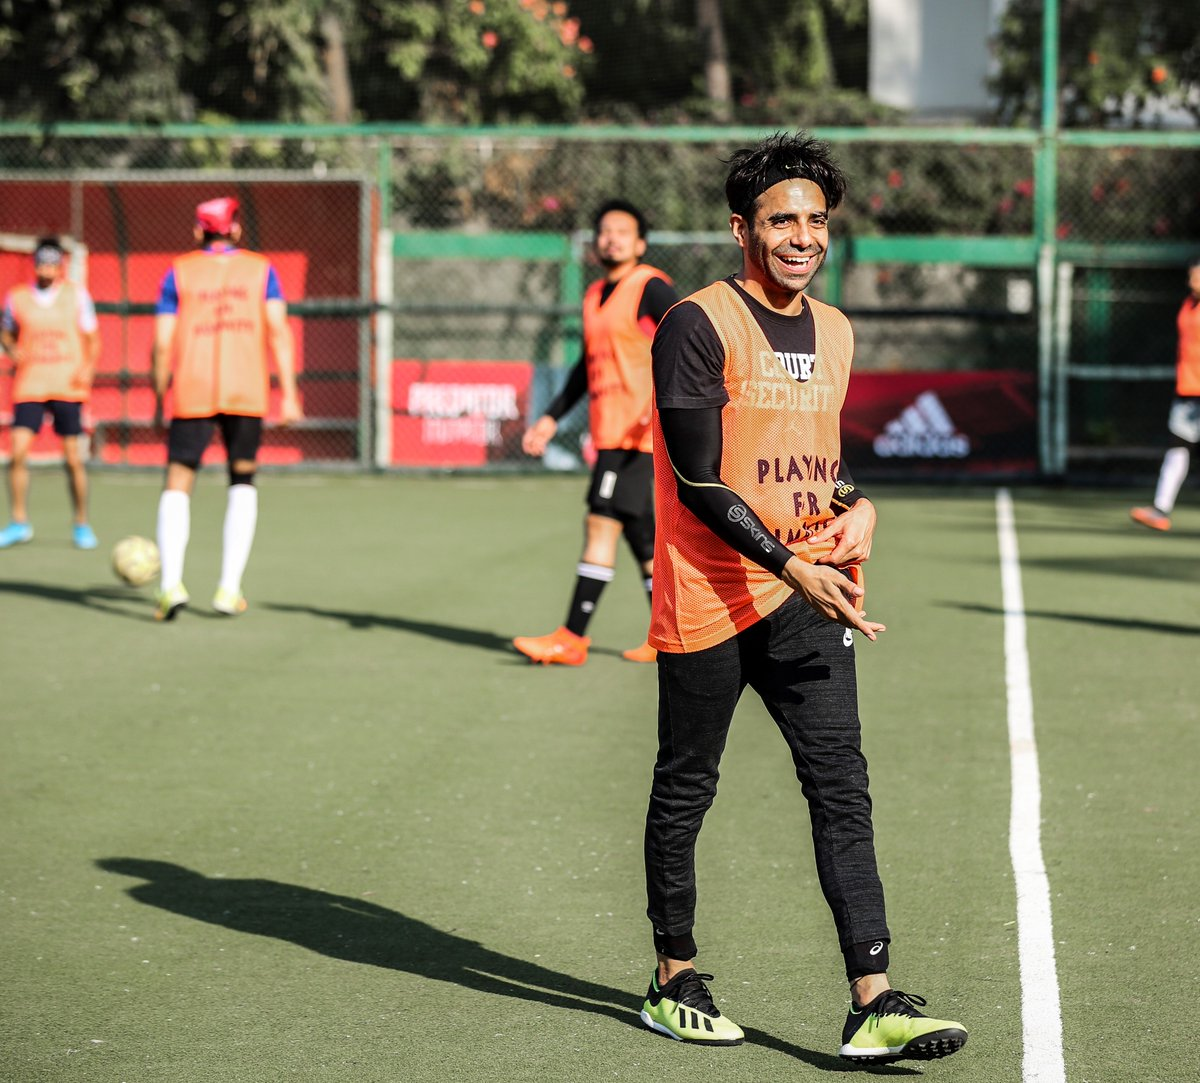 @Aparshakti's smile is as bright as the sun scorching down on him. . . #AllStarsFC #PlayingForHumanity #ASFC #Football #TheBeautifulGame #LetsPlay #Celebrities  #Bollywood #Celebspic.twitter.com/0wxSVdImvj